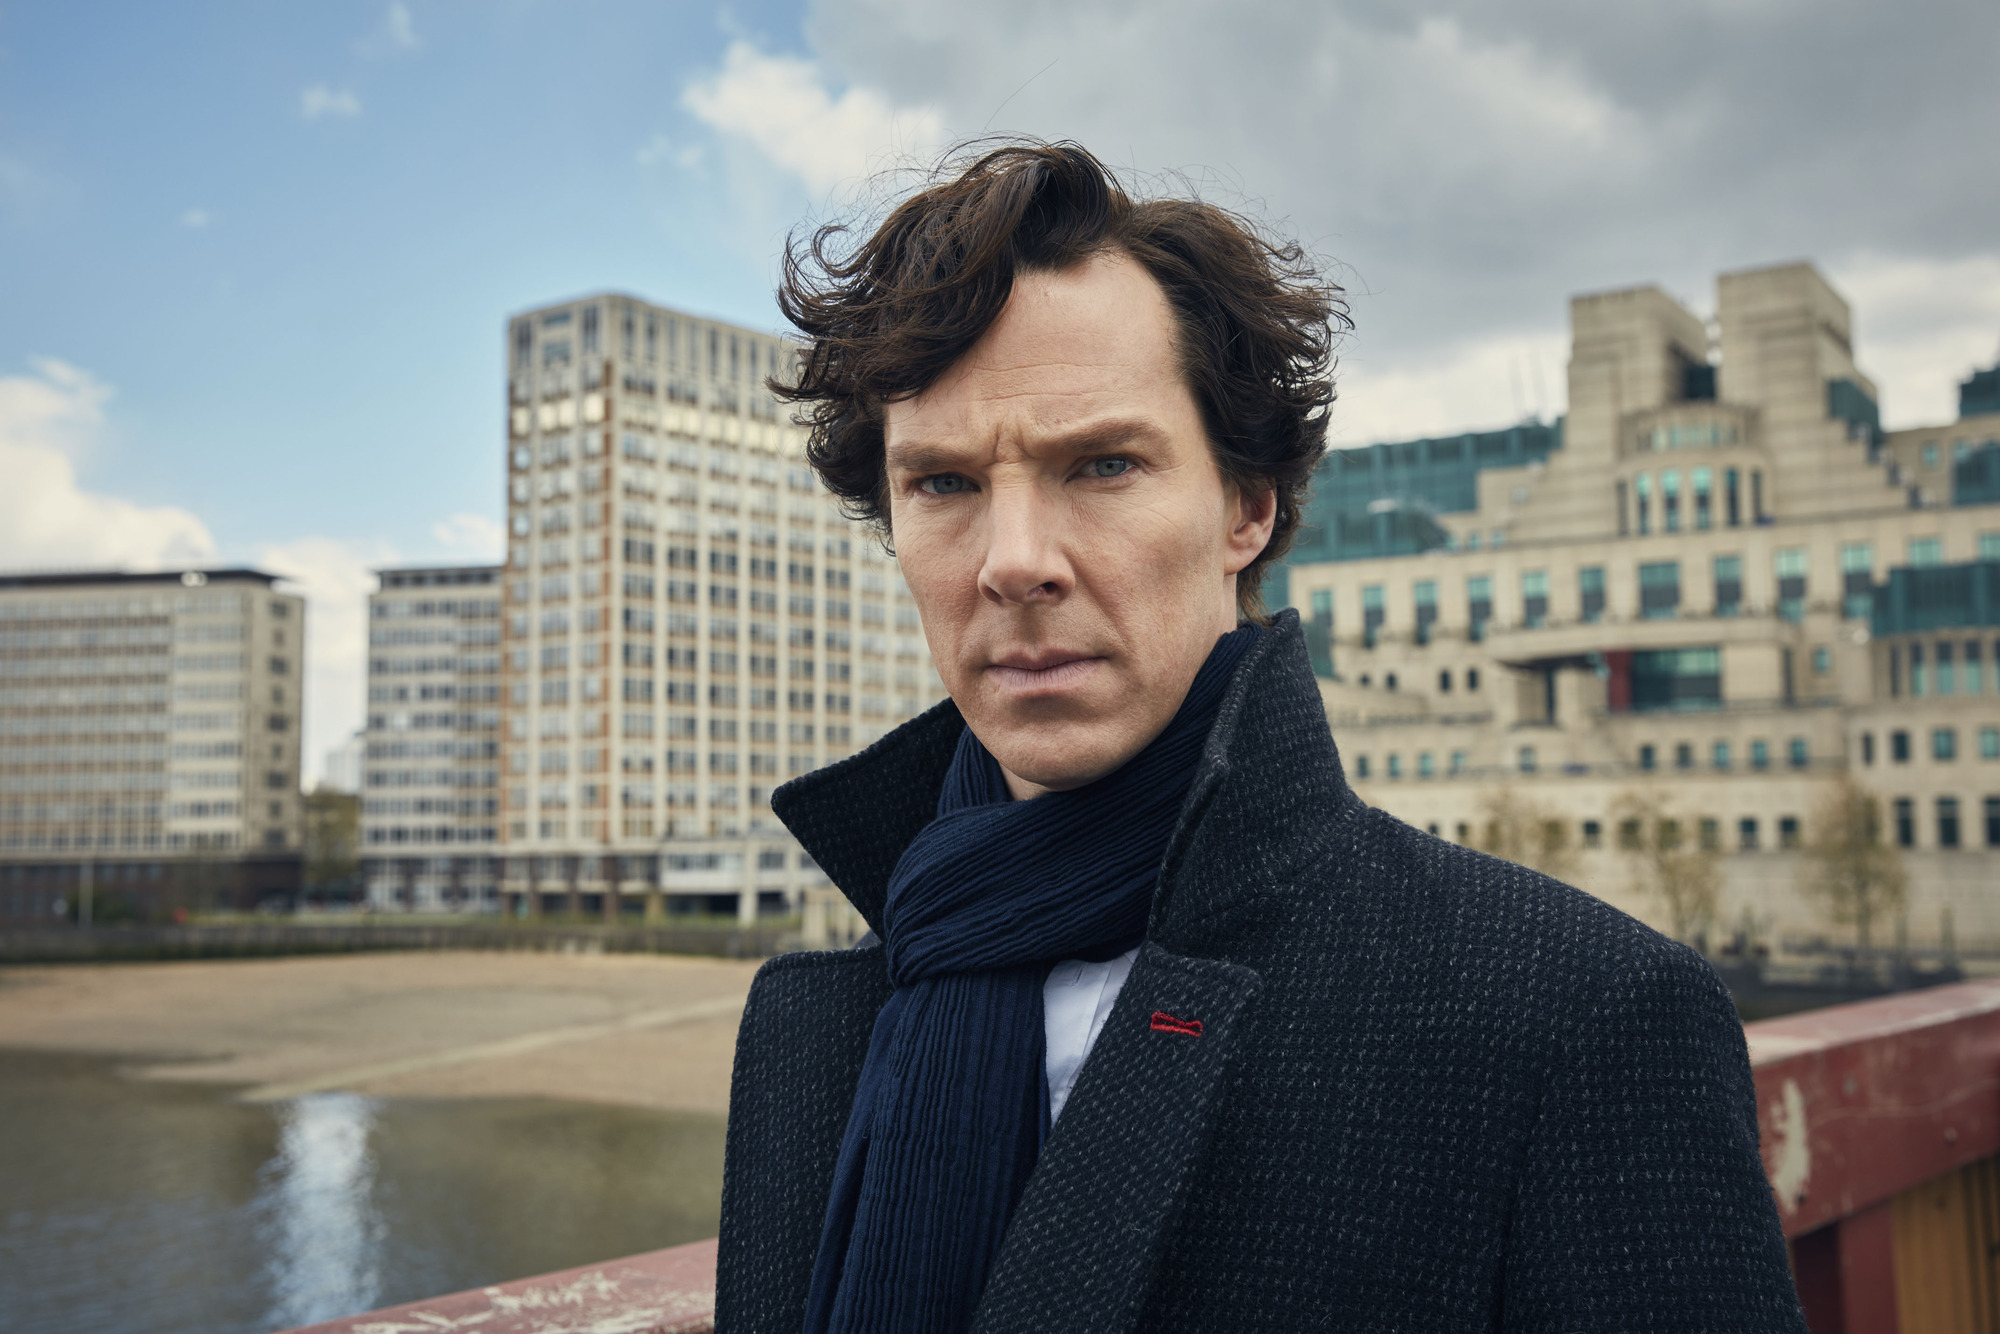 The Hair Apparent: Benedict Cumberbatch as Sherlock Holmes in Stan's  Sherlock